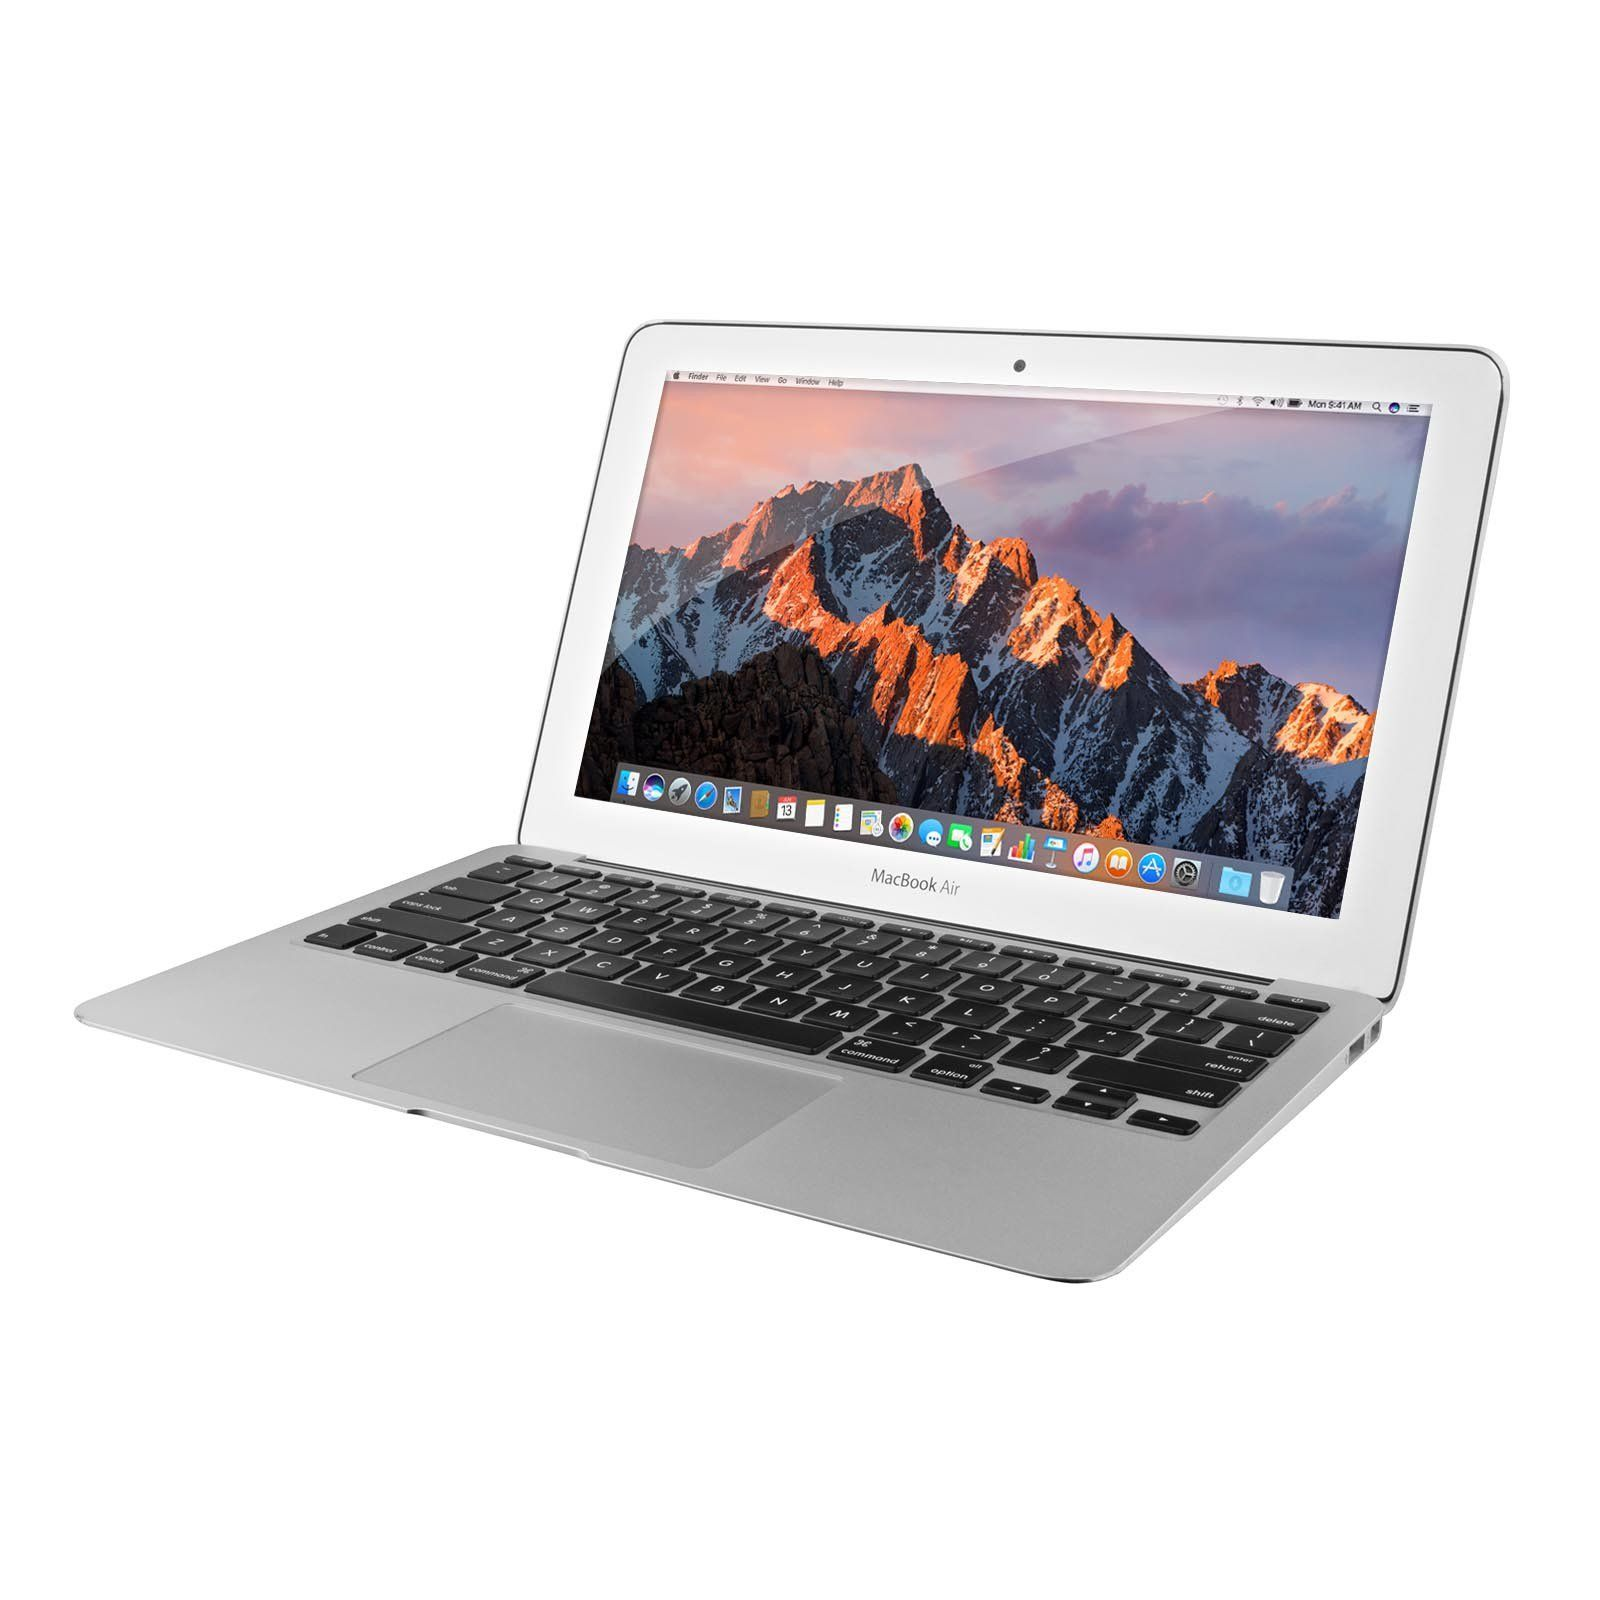 Refurbished Apple Macbook Air Core I5 1 6ghz 4gb Ram 128gb Ssd 11 A1465 Mjvm2ll A Walmart Com In 2021 Apple Macbook Good Cheap Laptops Laptop Cheap